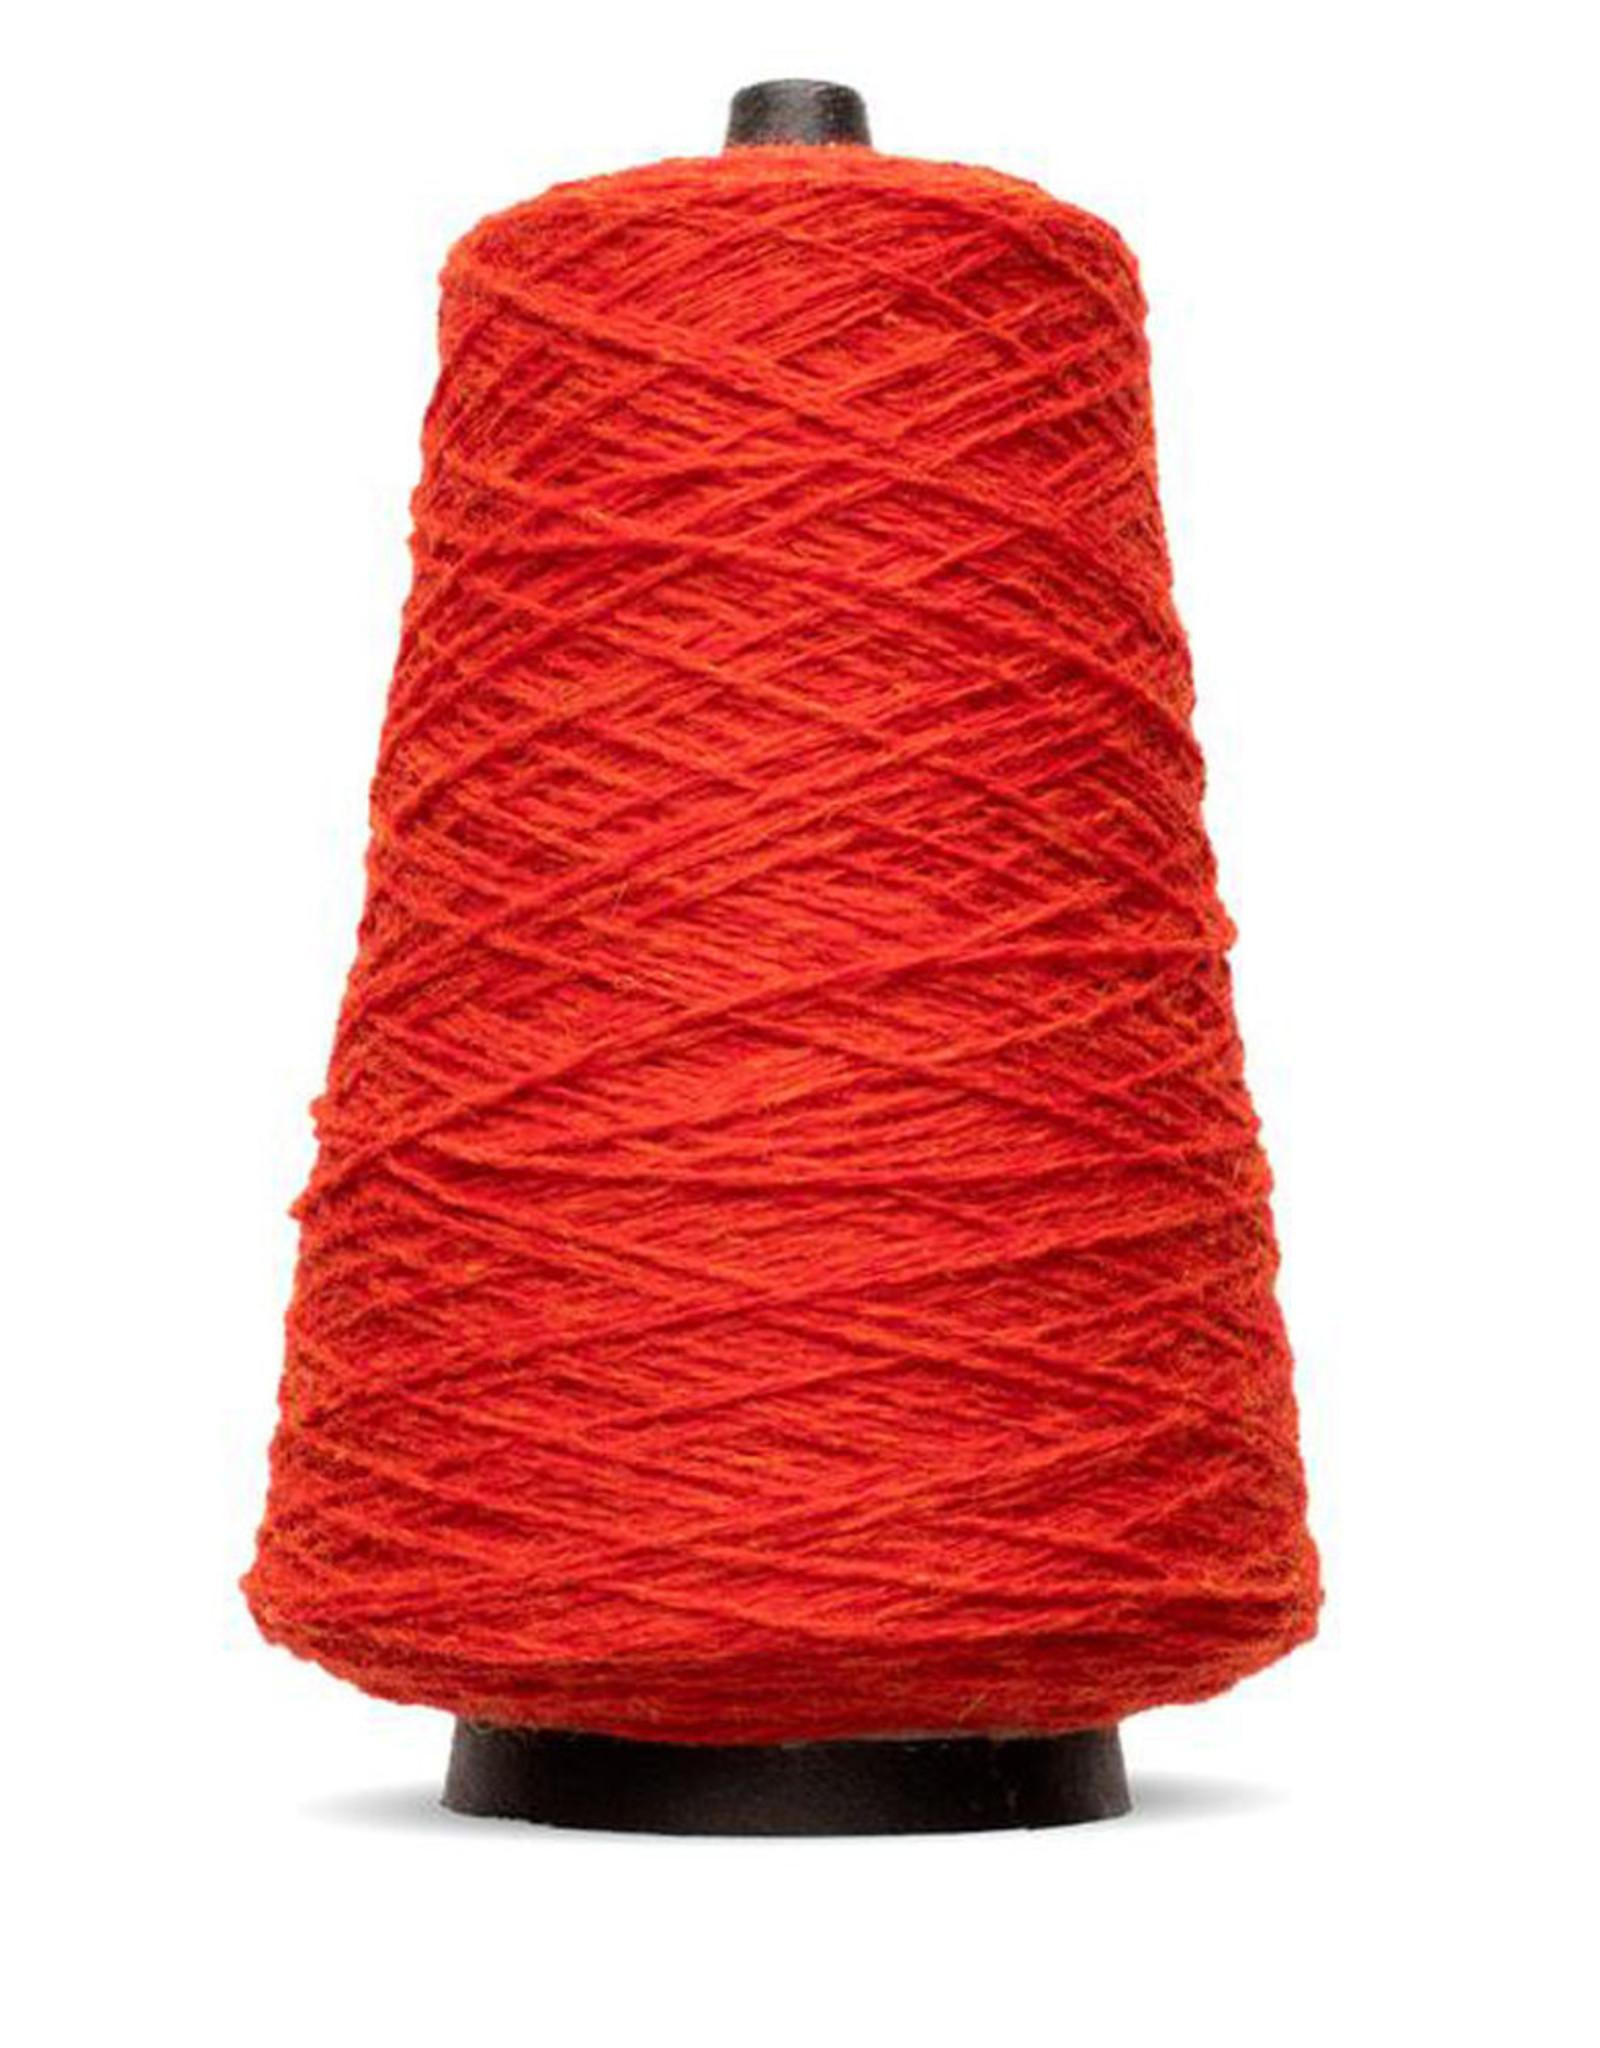 Shetland 1/2 Lb Cone